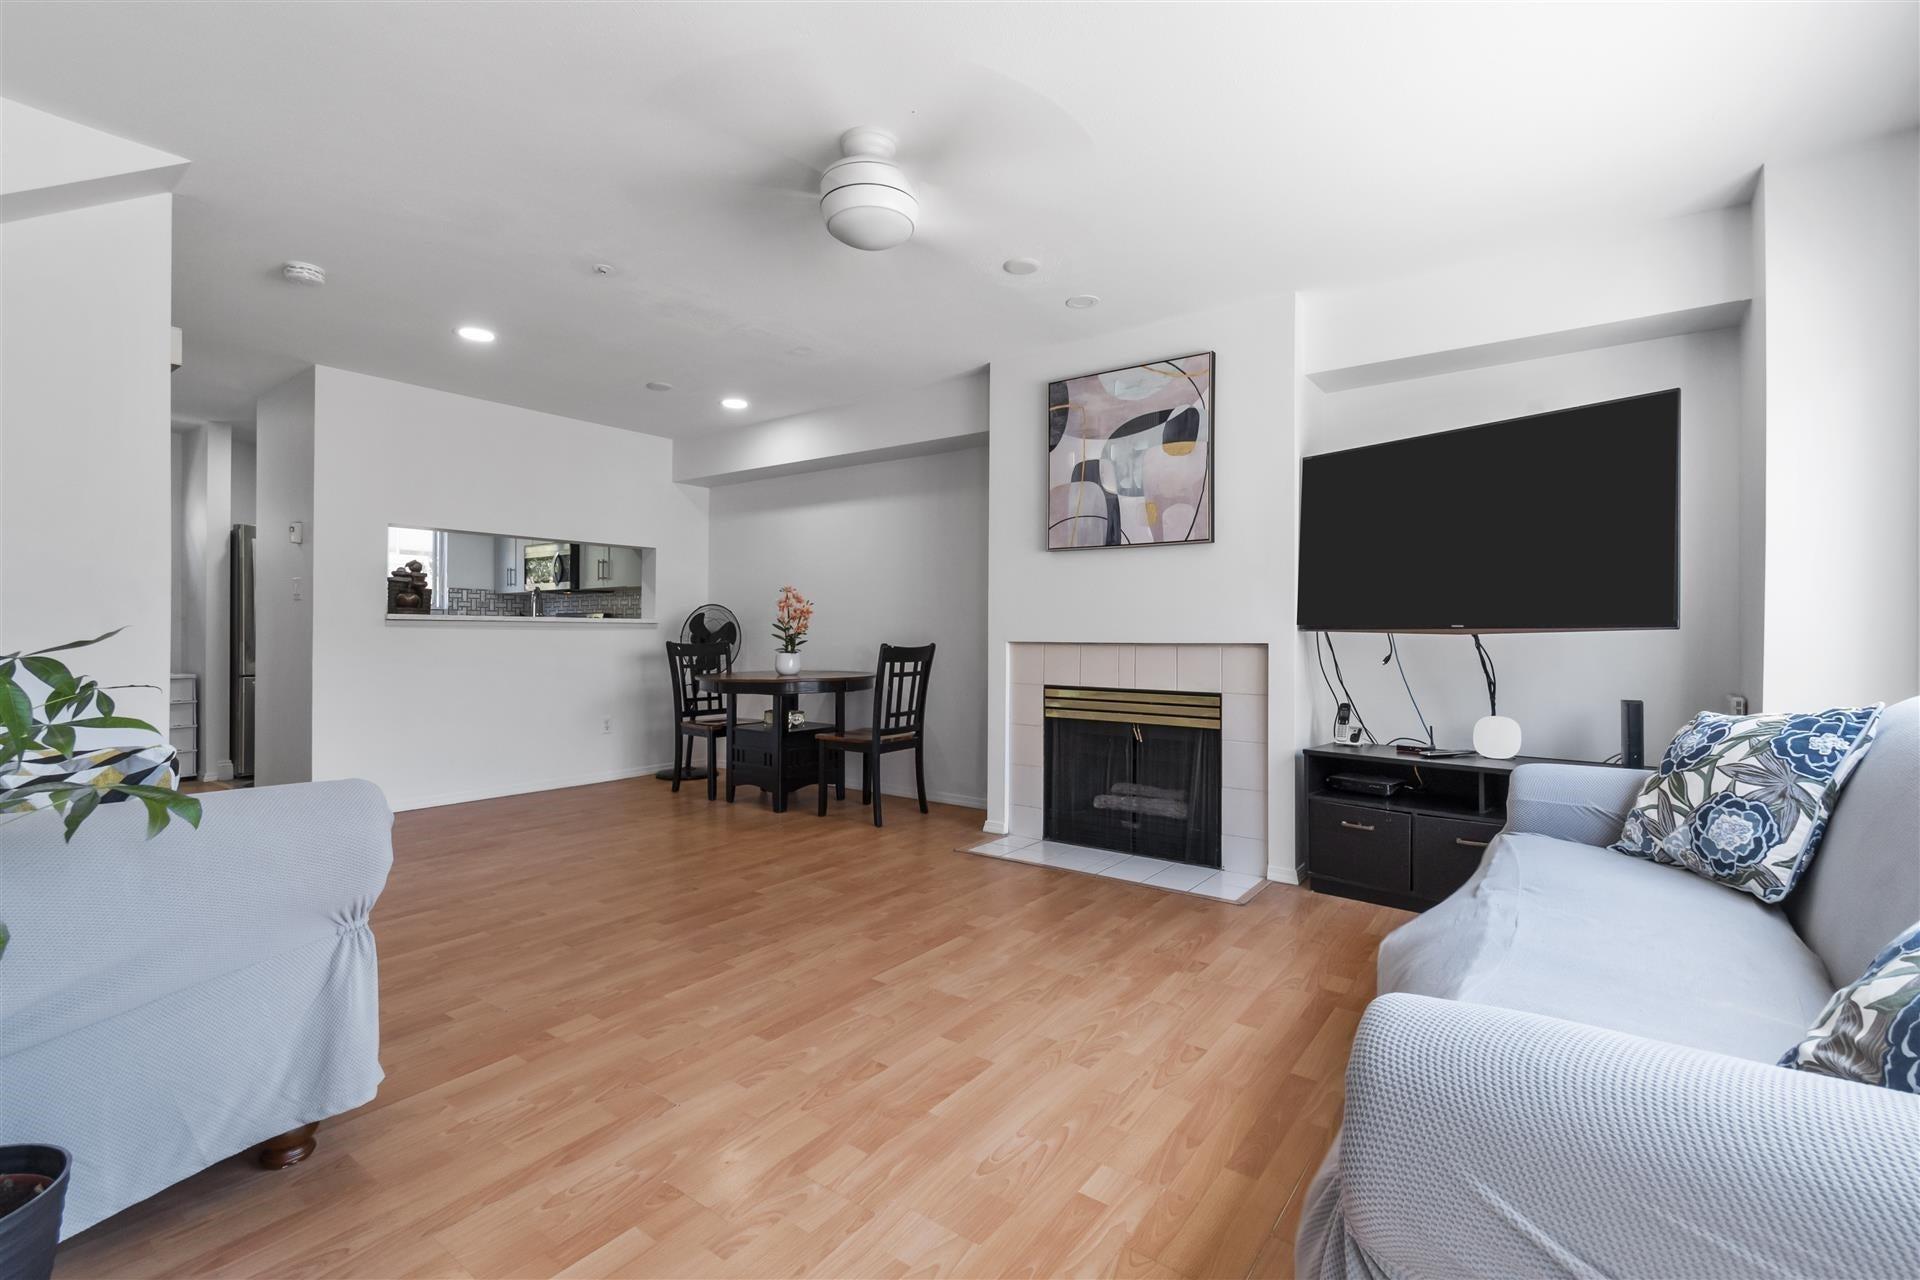 207 2211 NO. 4 ROAD - Bridgeport RI Townhouse for sale, 2 Bedrooms (R2613792)